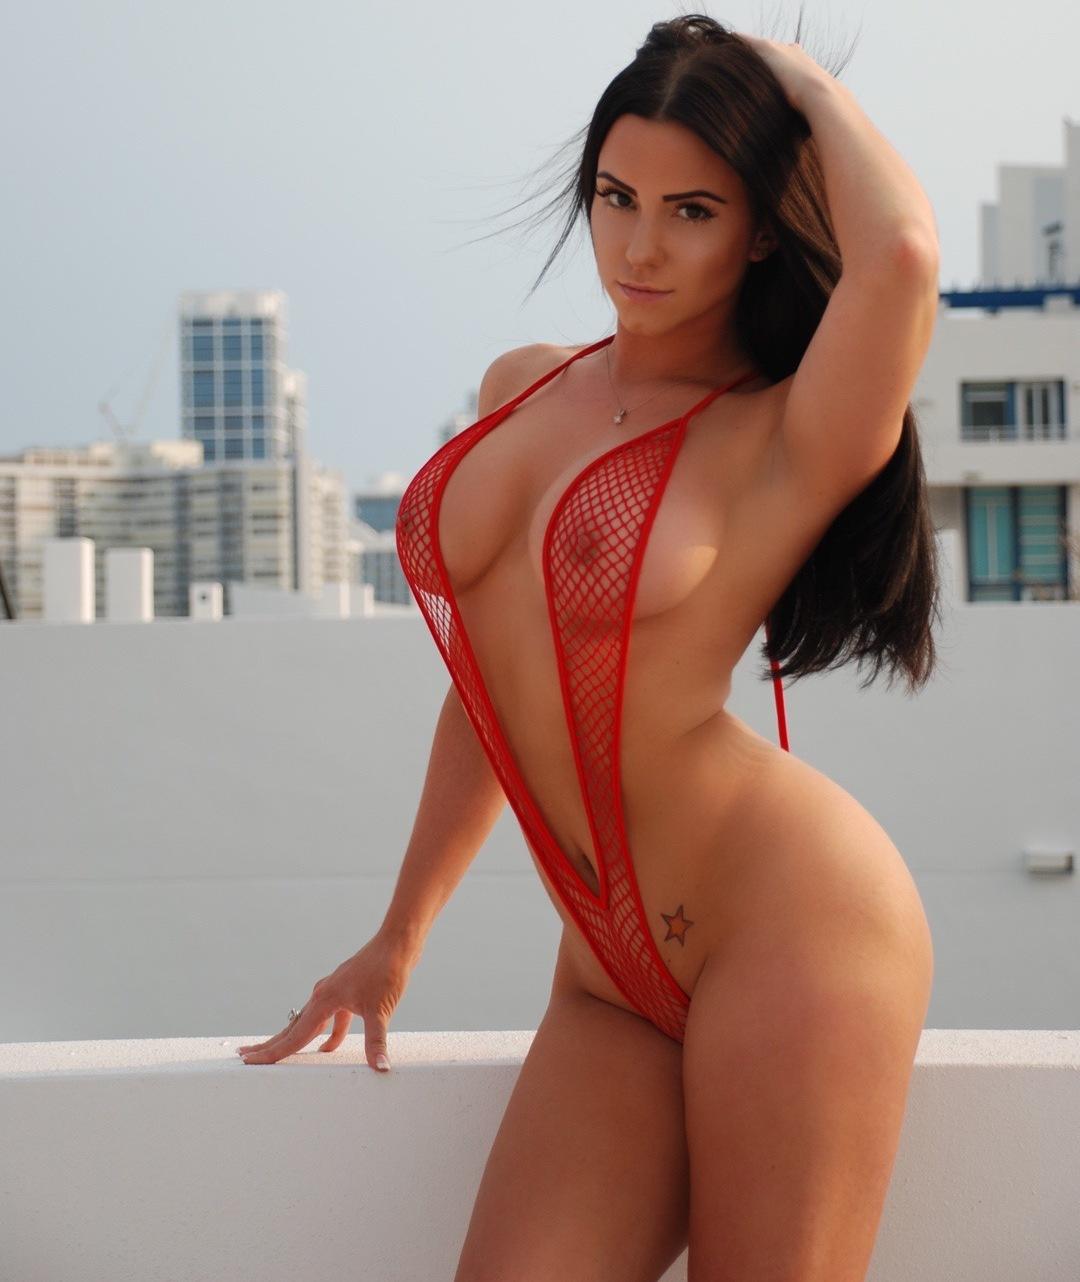 Darla Pursley Darlapursley Onlyfans Nudes Leaks 0003